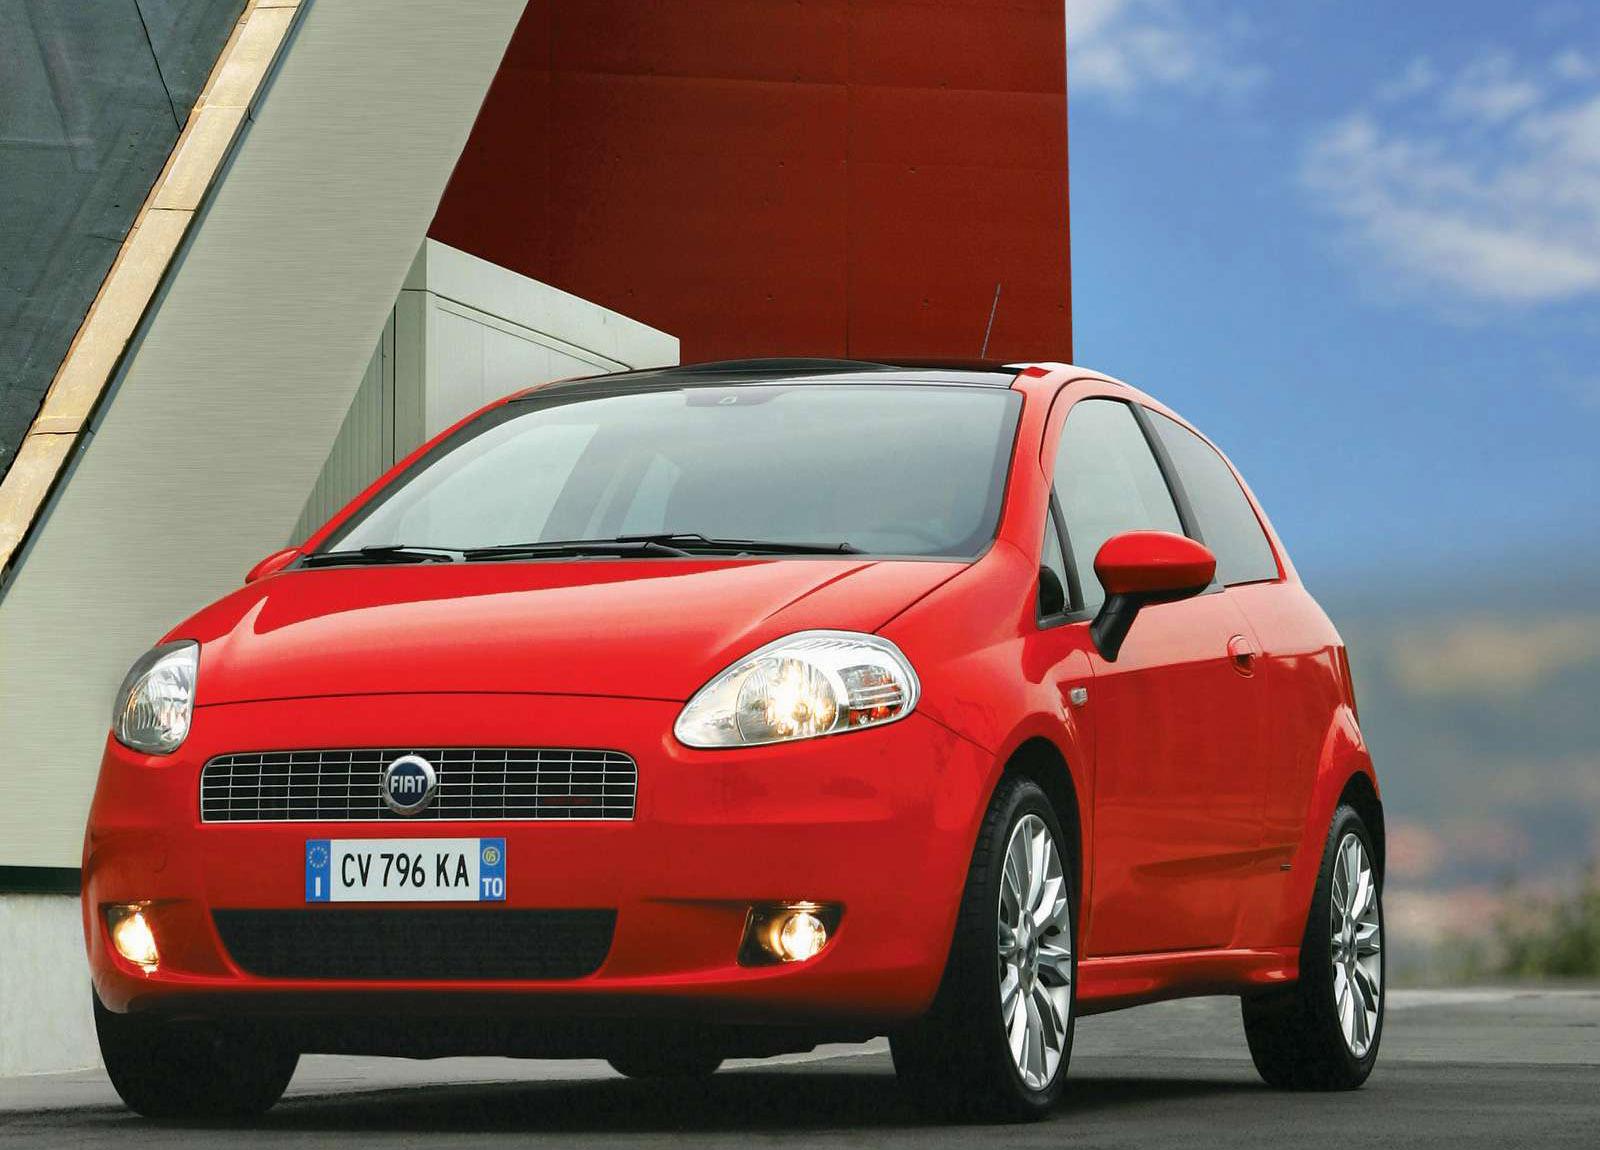 2005 Fiat Grande Punto Hd Pictures Carsinvasion Com